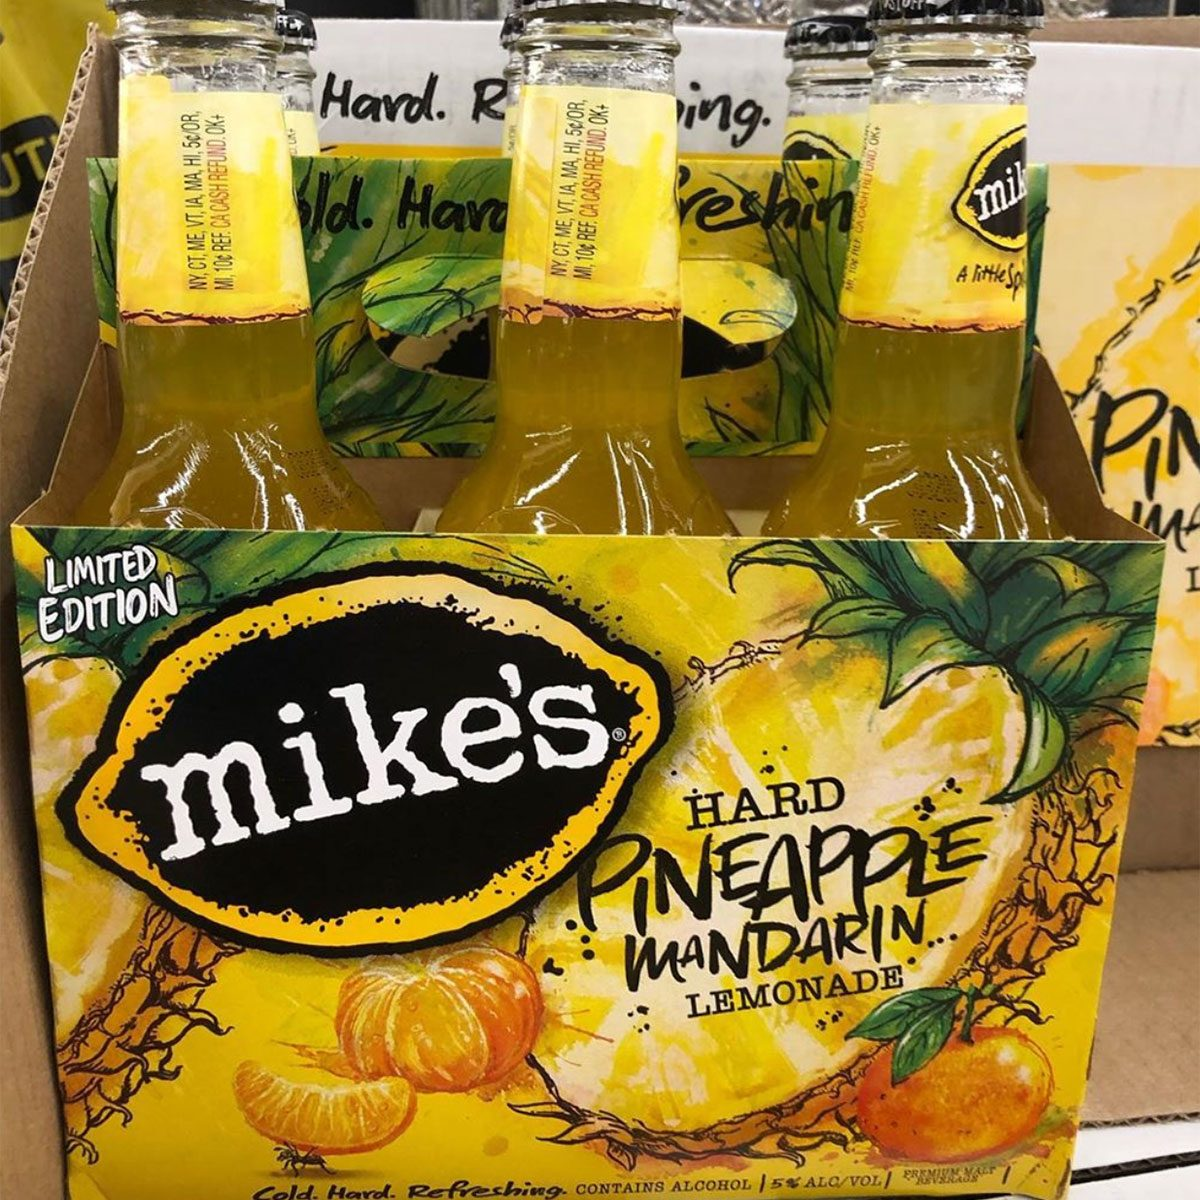 Mike's Hard Pineapple Mandarin Lemonade